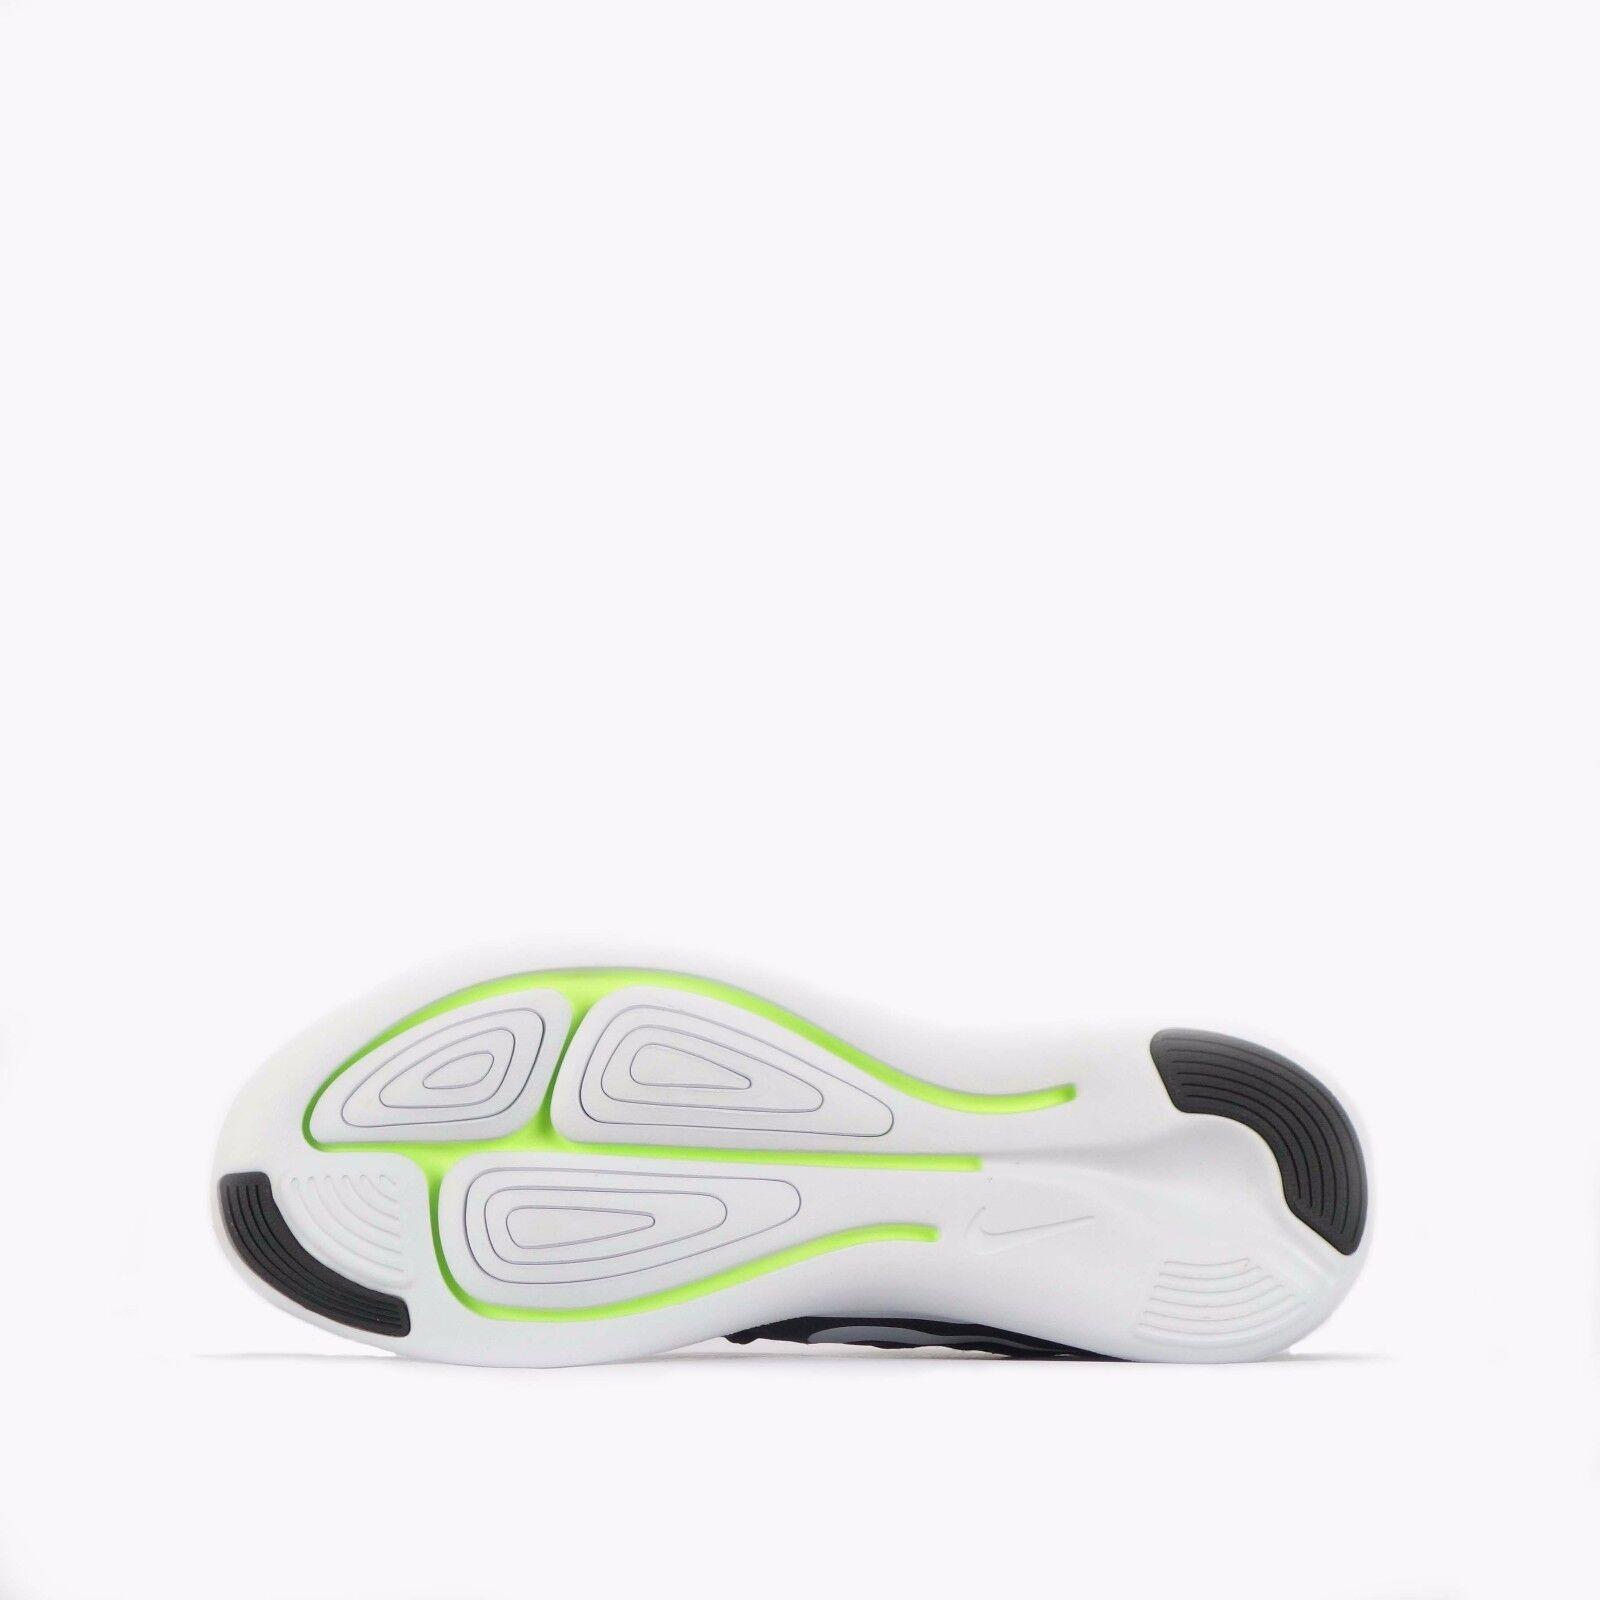 NIKE lunarstelos homme Minuit chaussures Course Minuit homme BROUILLARD/Blanc-Noir ca7b35